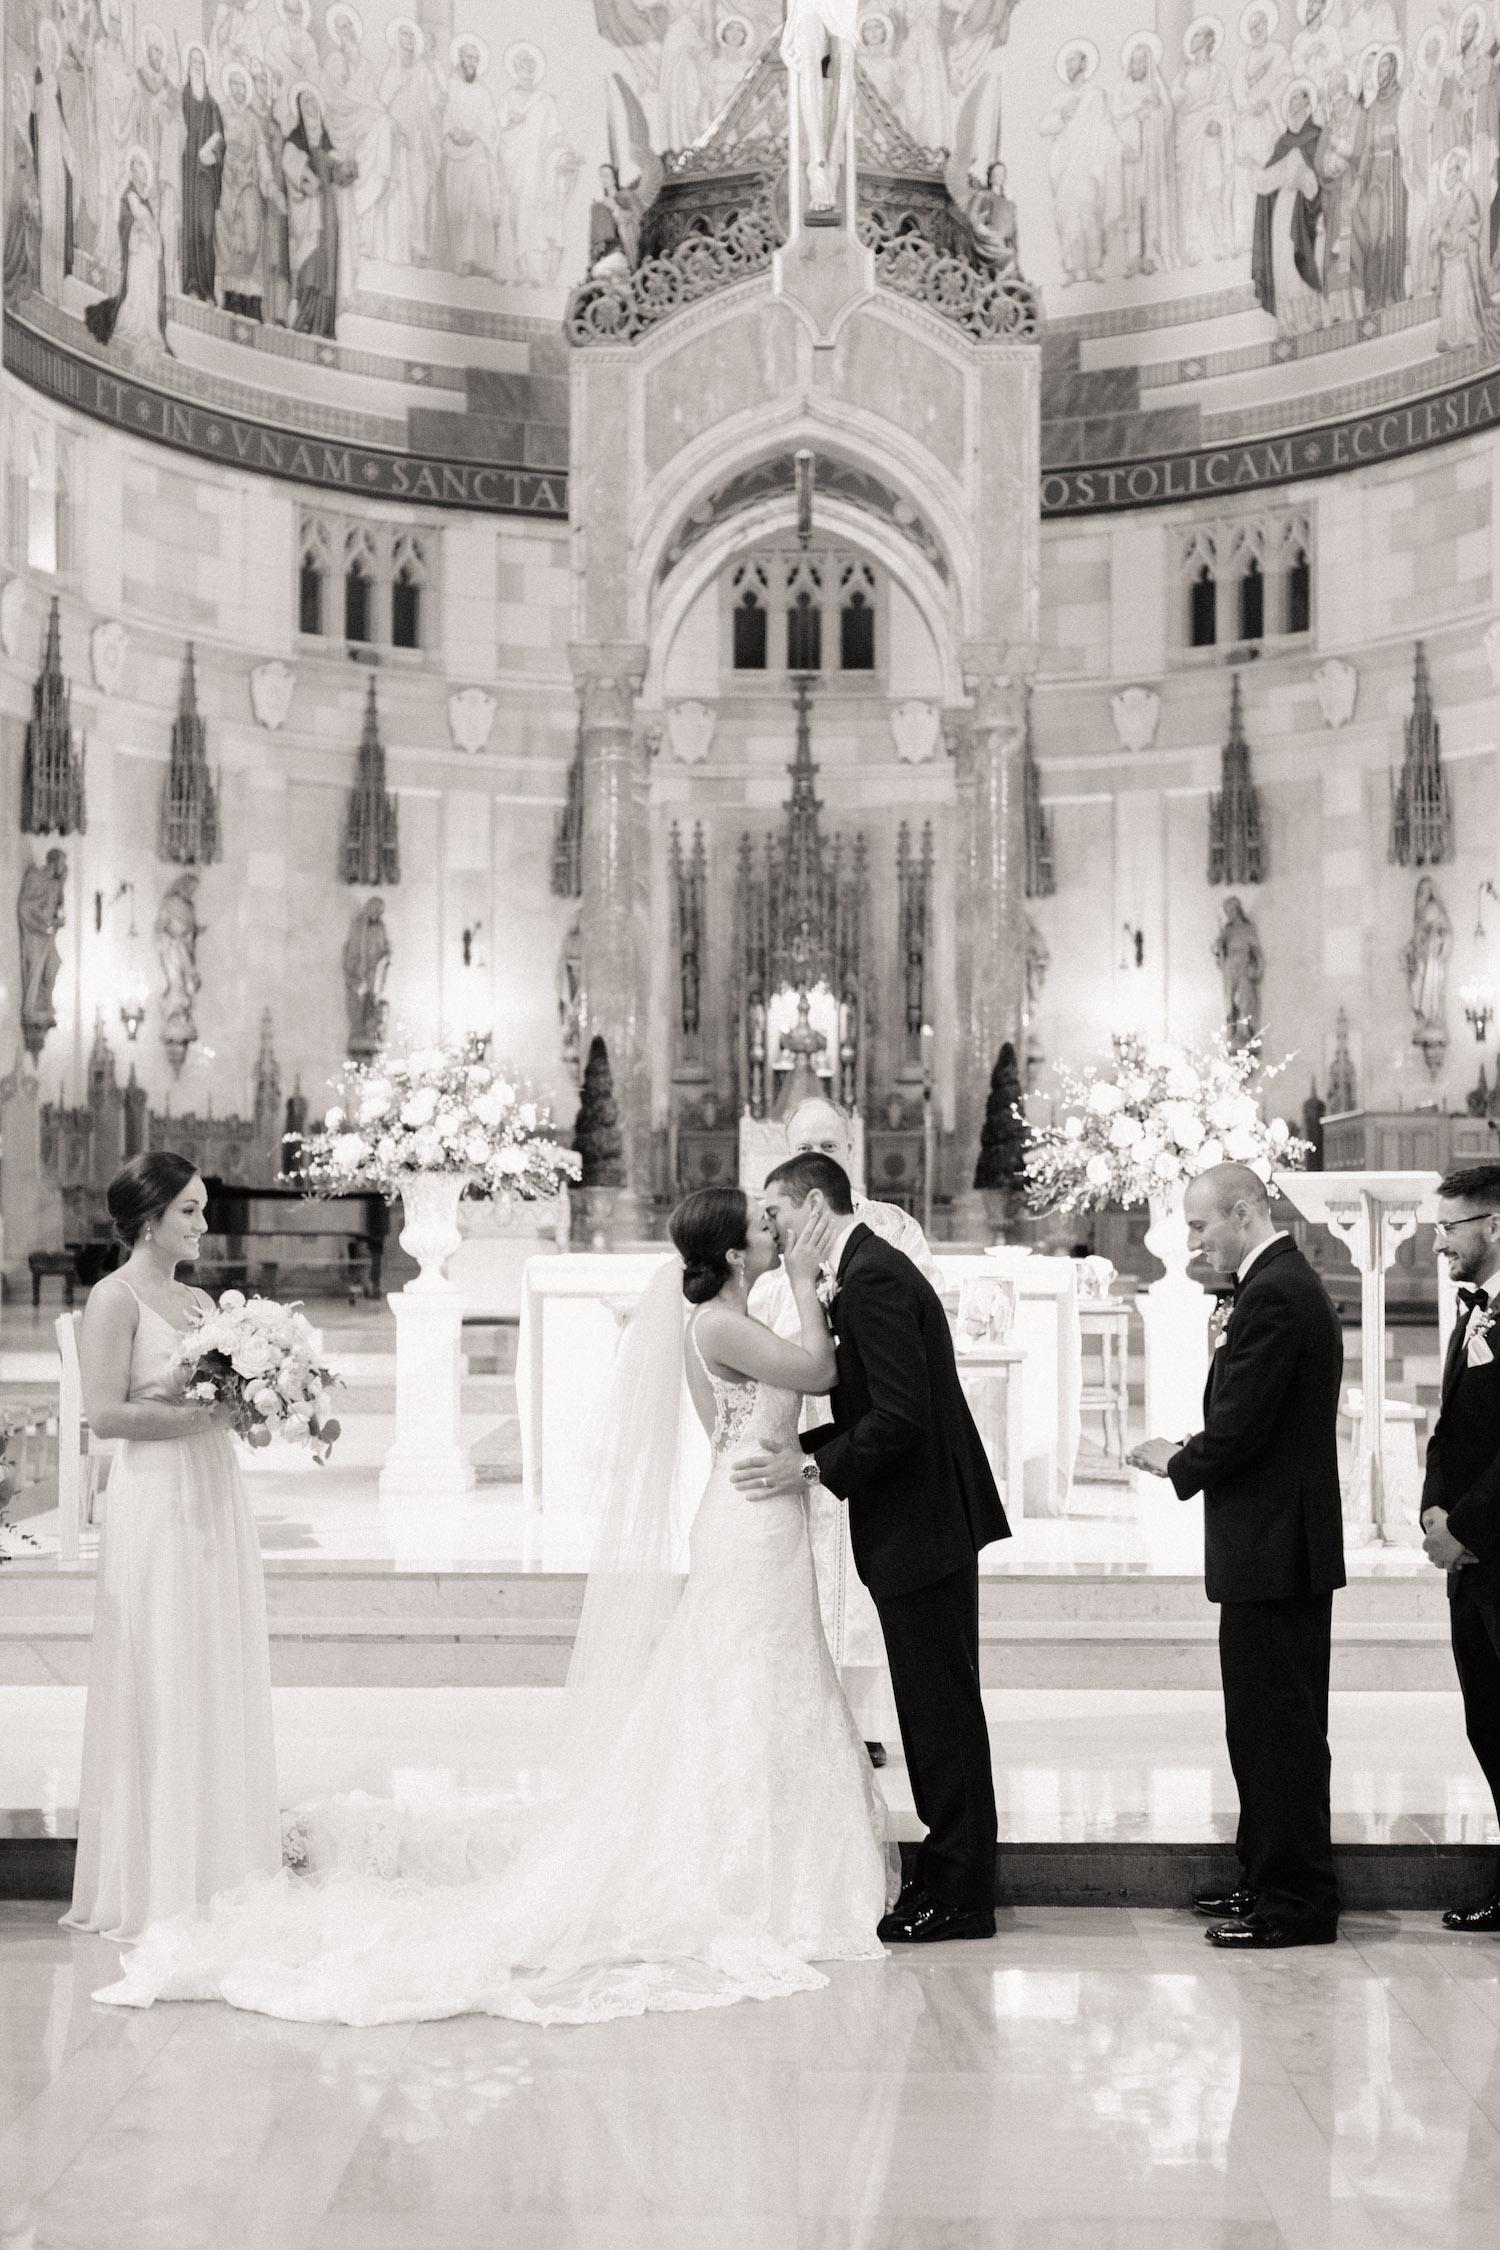 Toledo-Renaissance-Wedding-3506-2.jpg